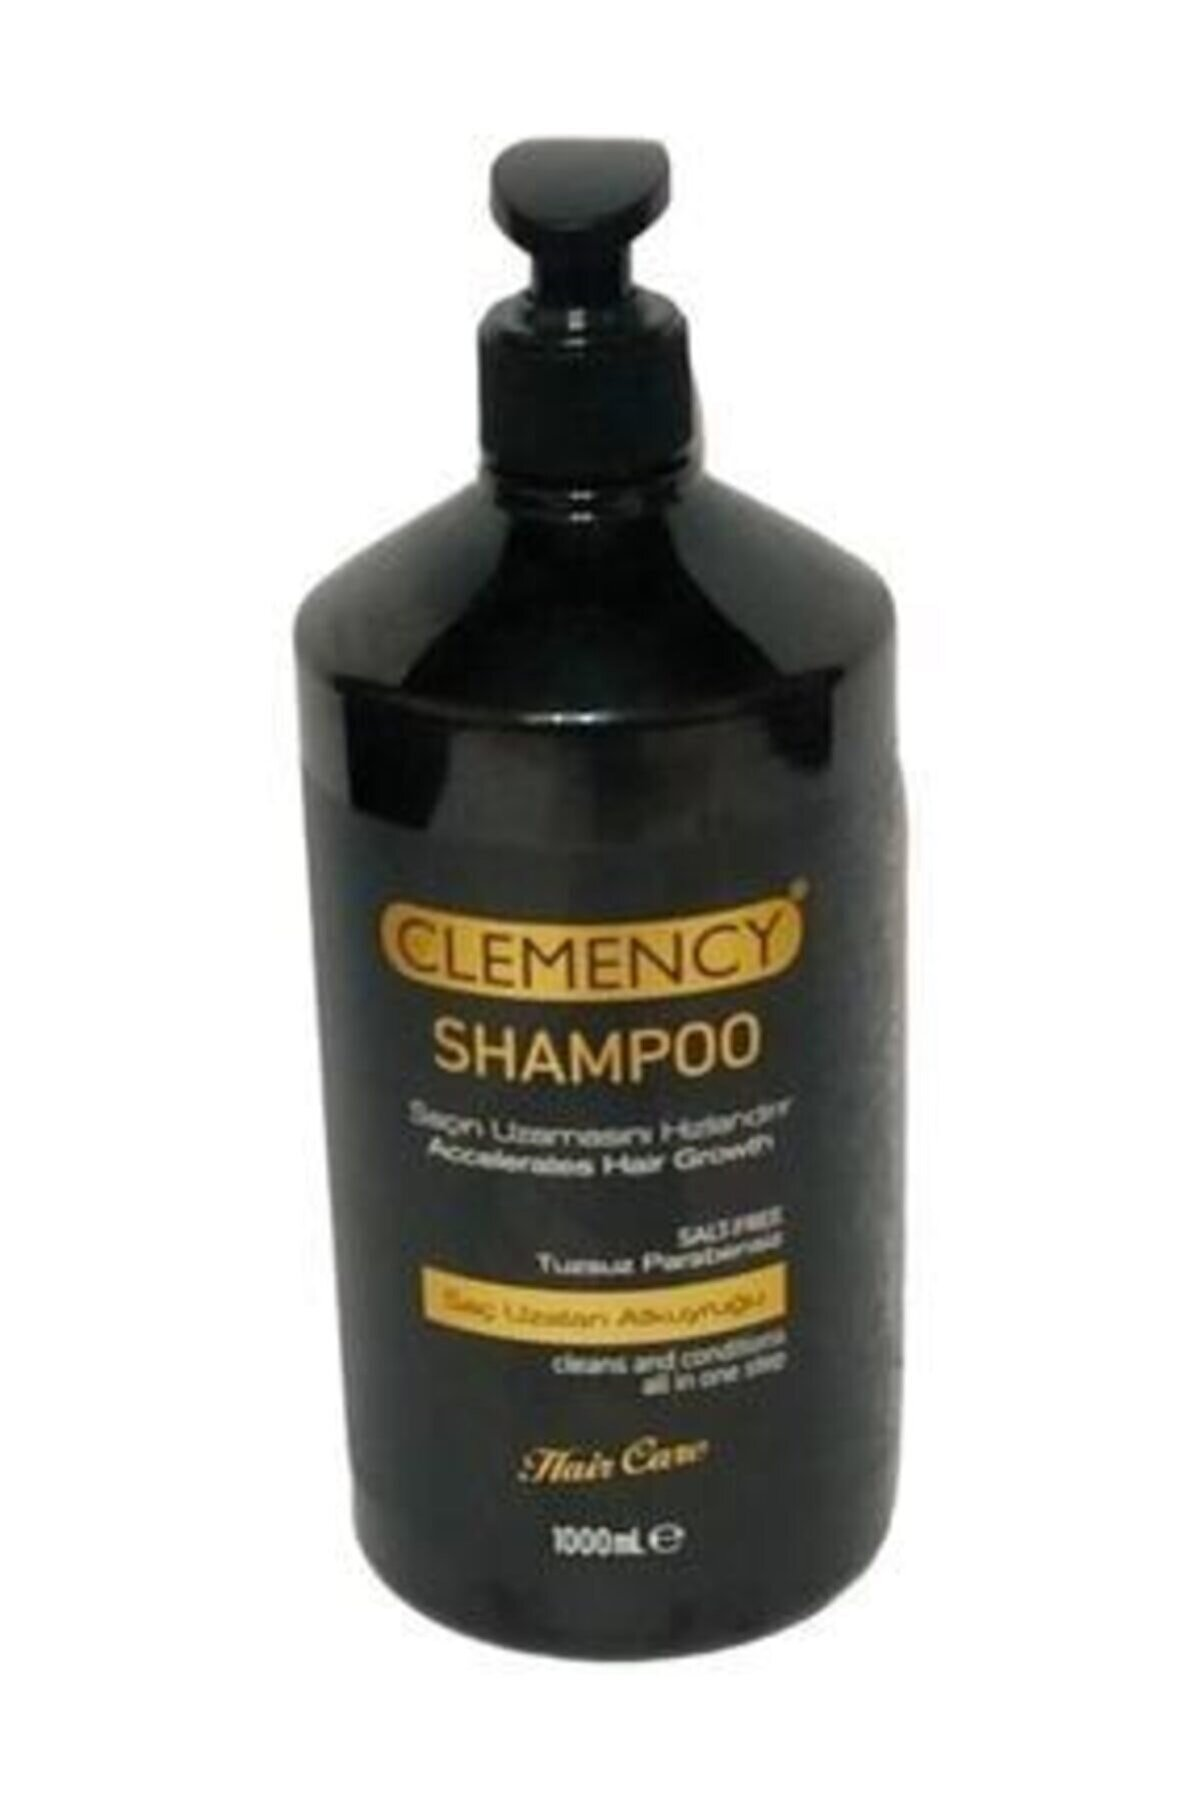 Clemency Saç Uzatan Atkuyruğu Tuzsuz Parabensiz Şampuan 1000 ml